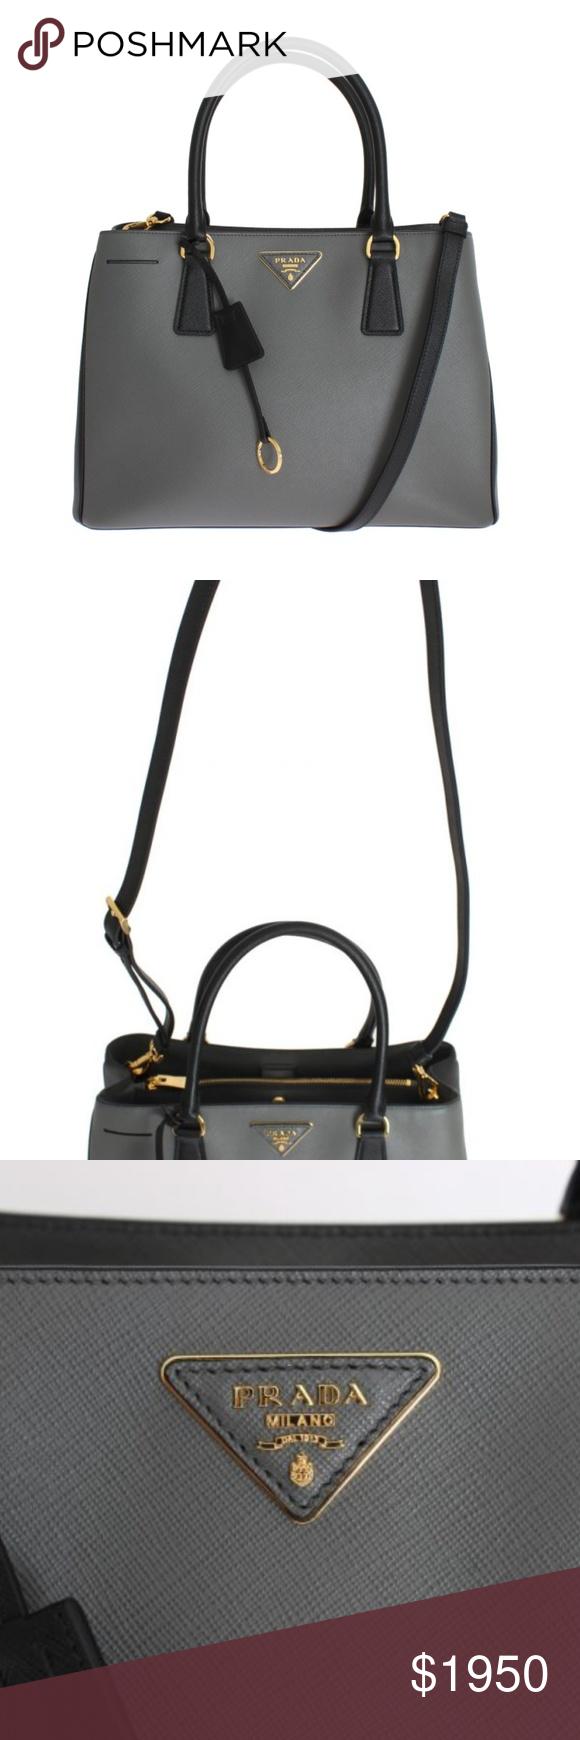 75eb7d64ef canada prada saffiano lux bag gorgeous brand new with tags 100 authentic prada  bag. 6db4b